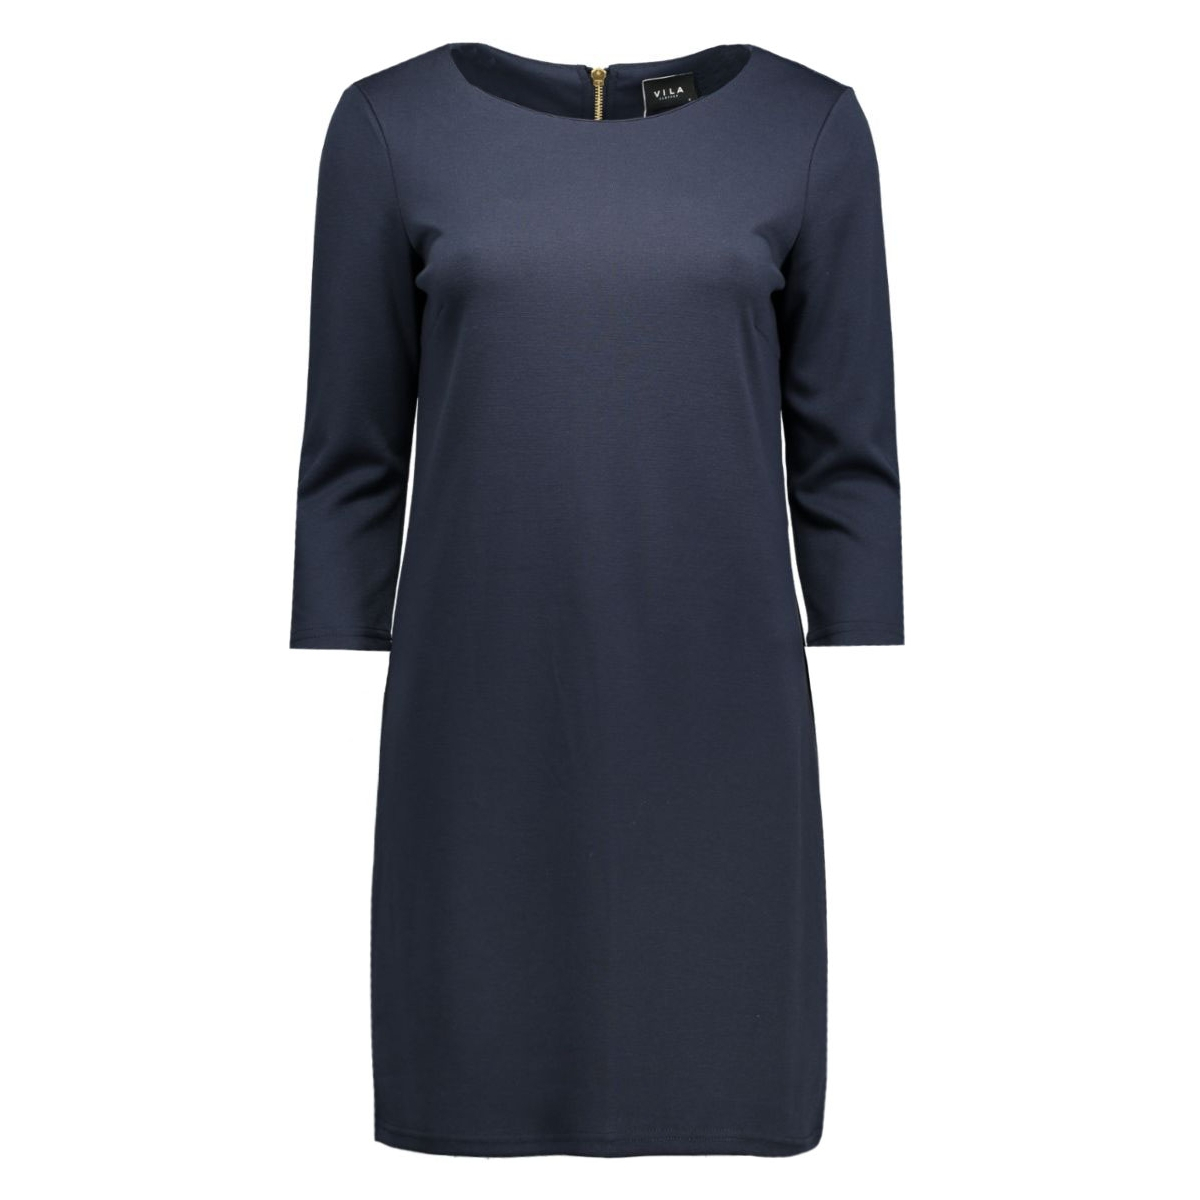 vitinny new dress-noos 14033863 vila jurk total eclipse